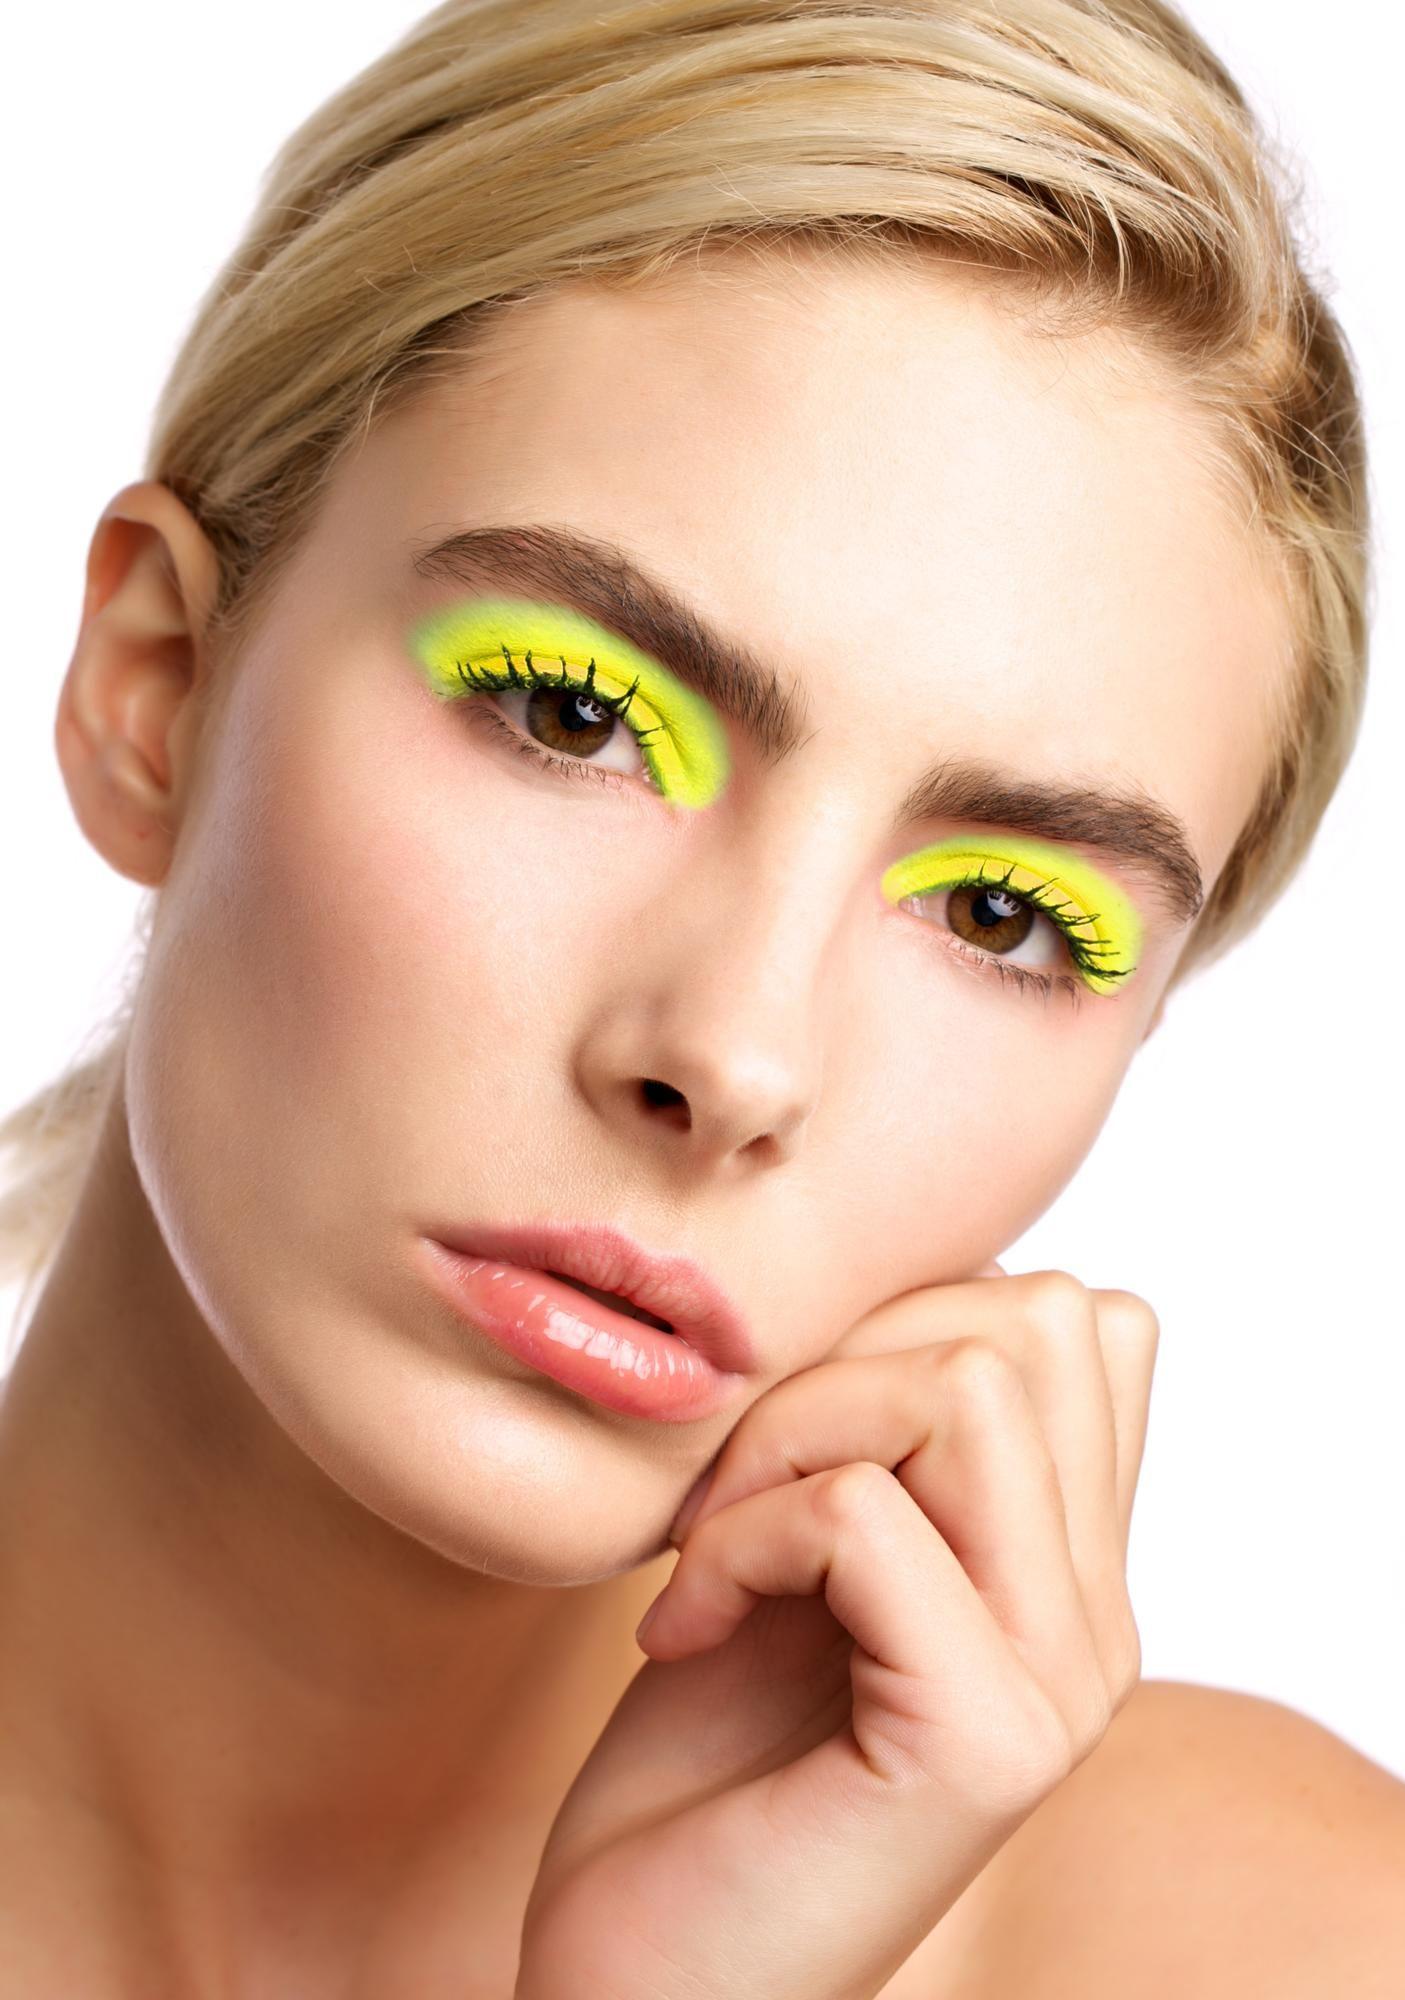 Stargazer Radiate UV Neon Loose Eyeshadow